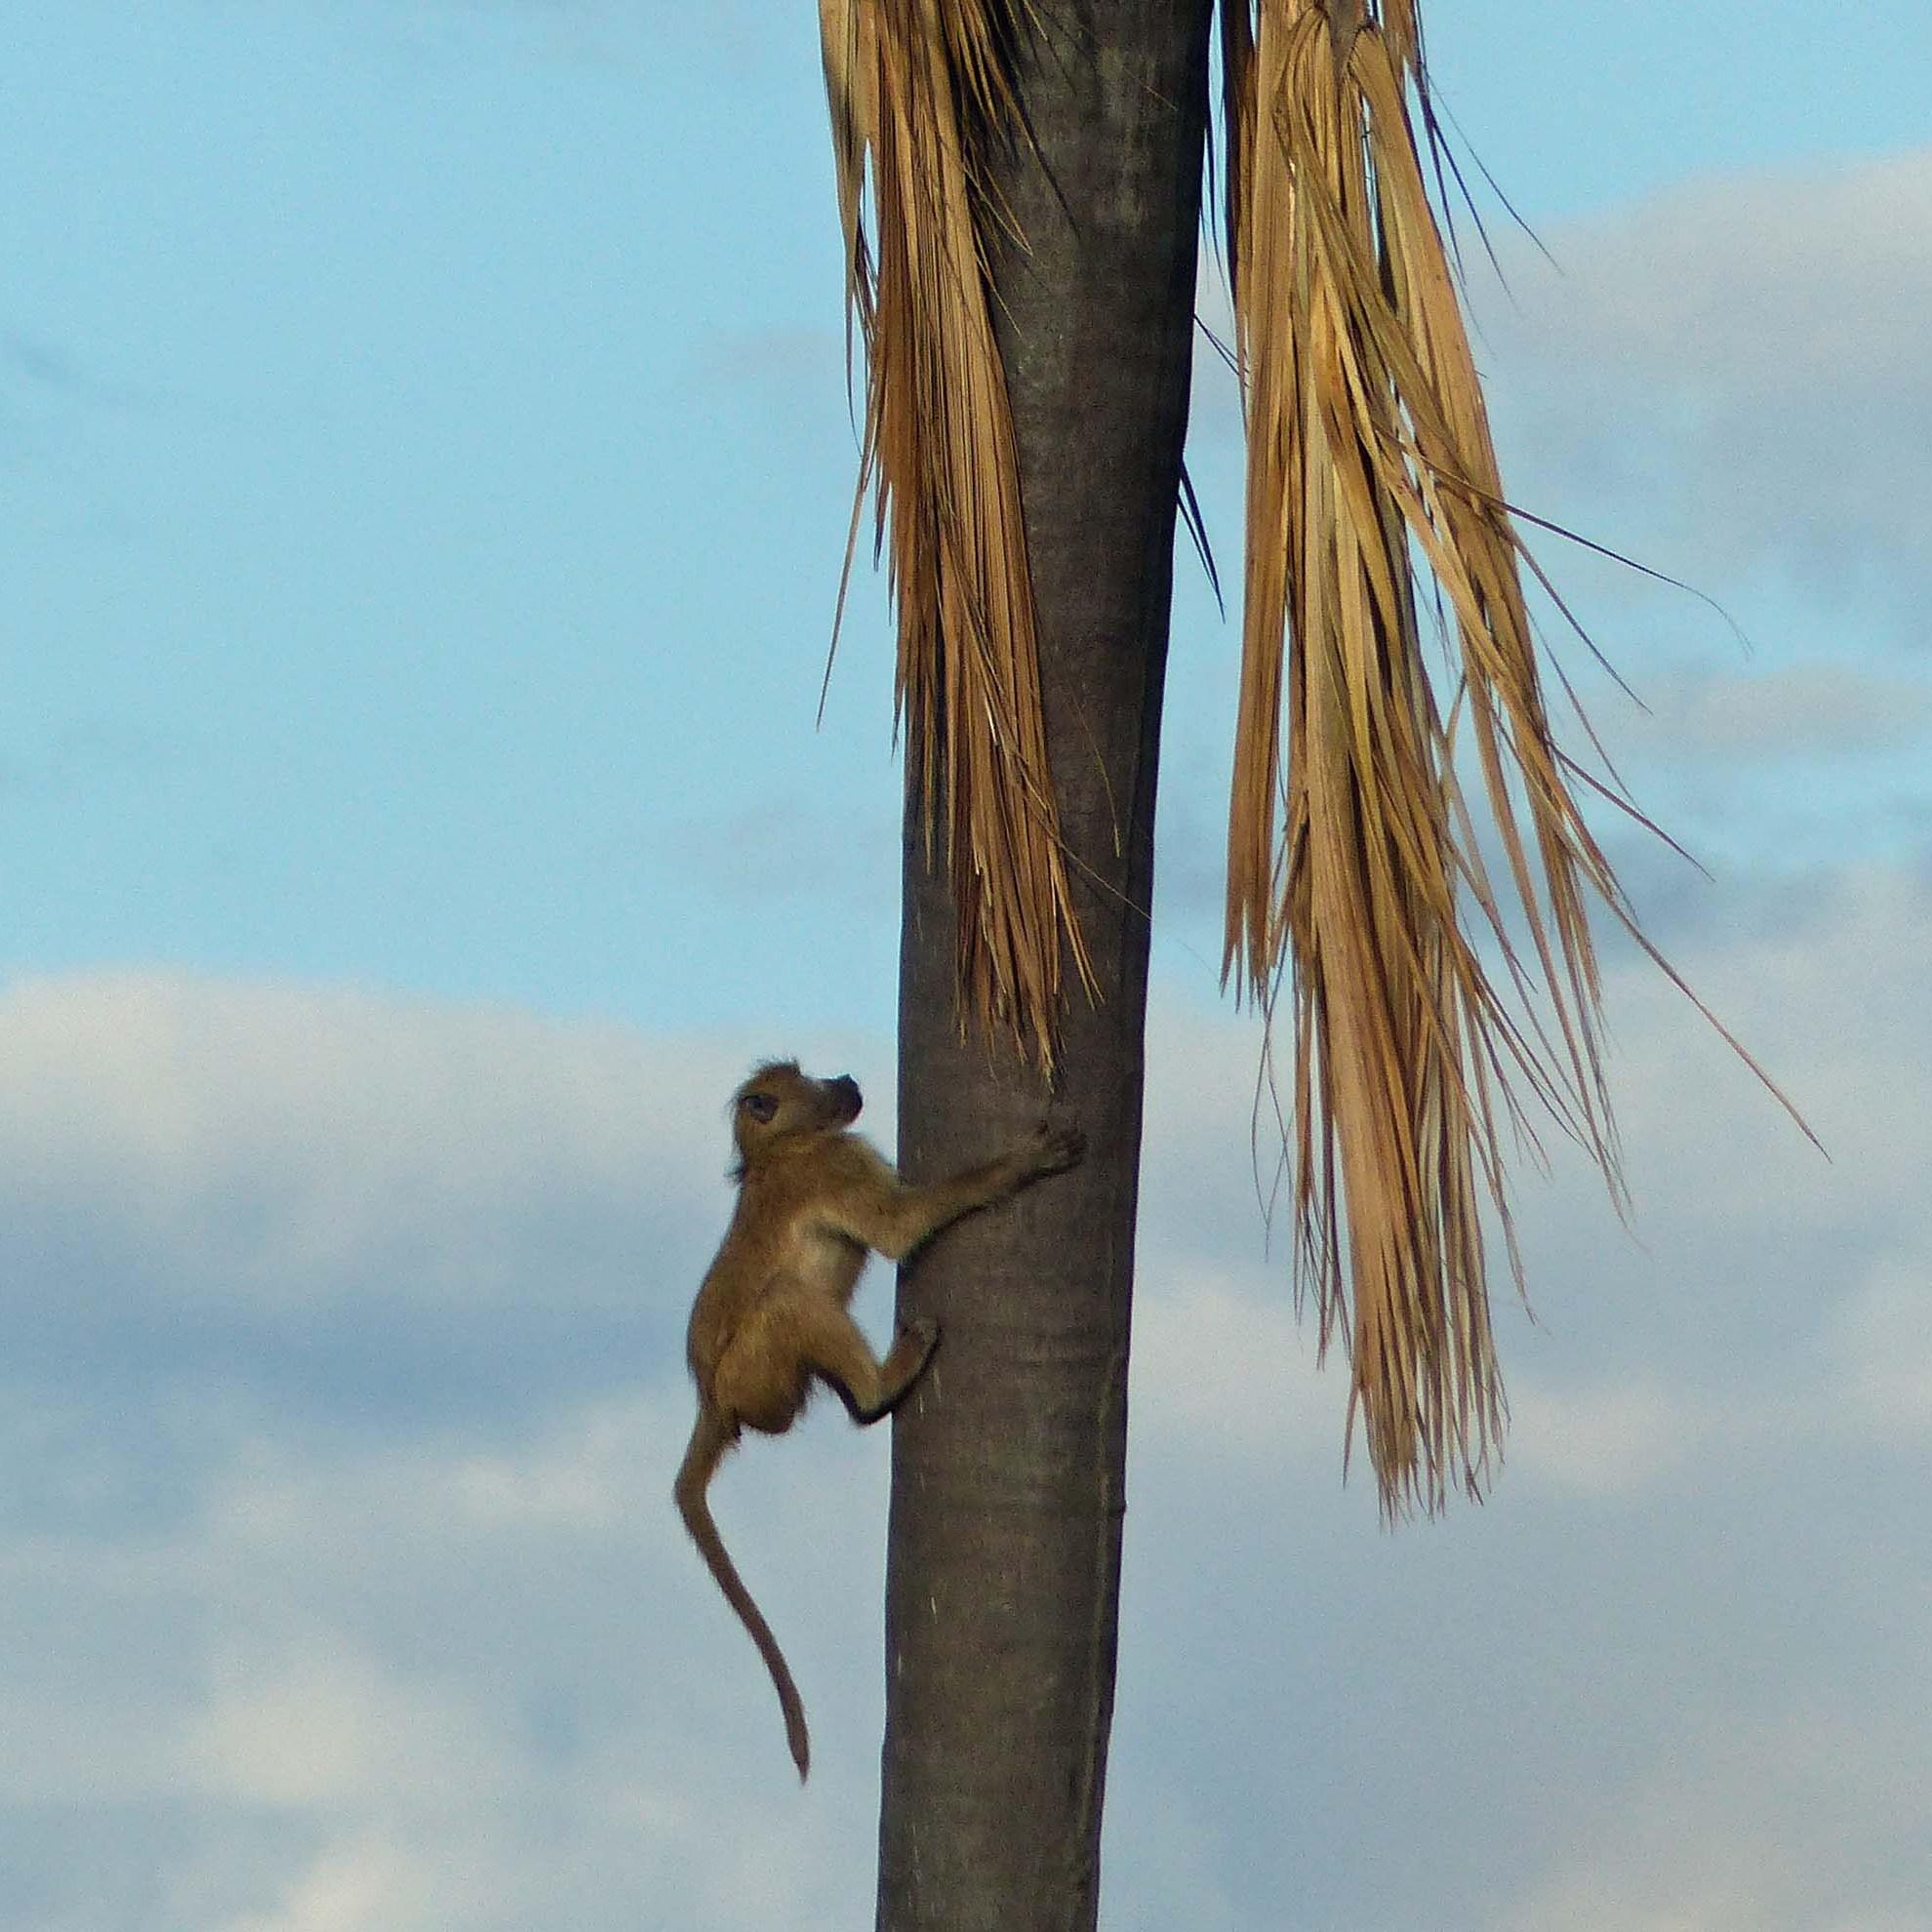 Baboon climbing a tree trunk